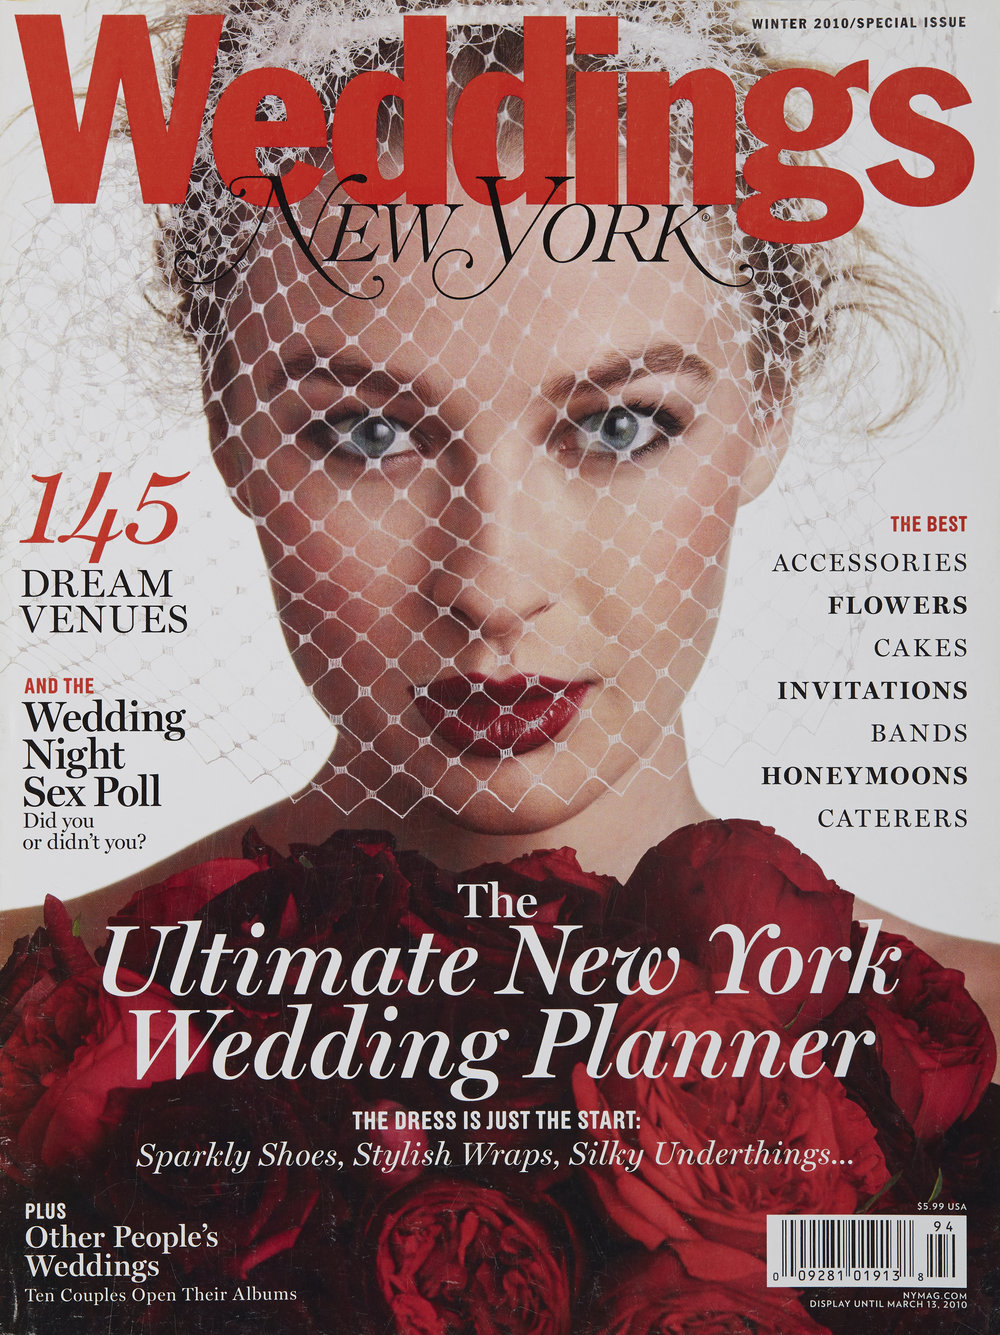 NY MAGAZINE WEDDINGS WINTER 2010